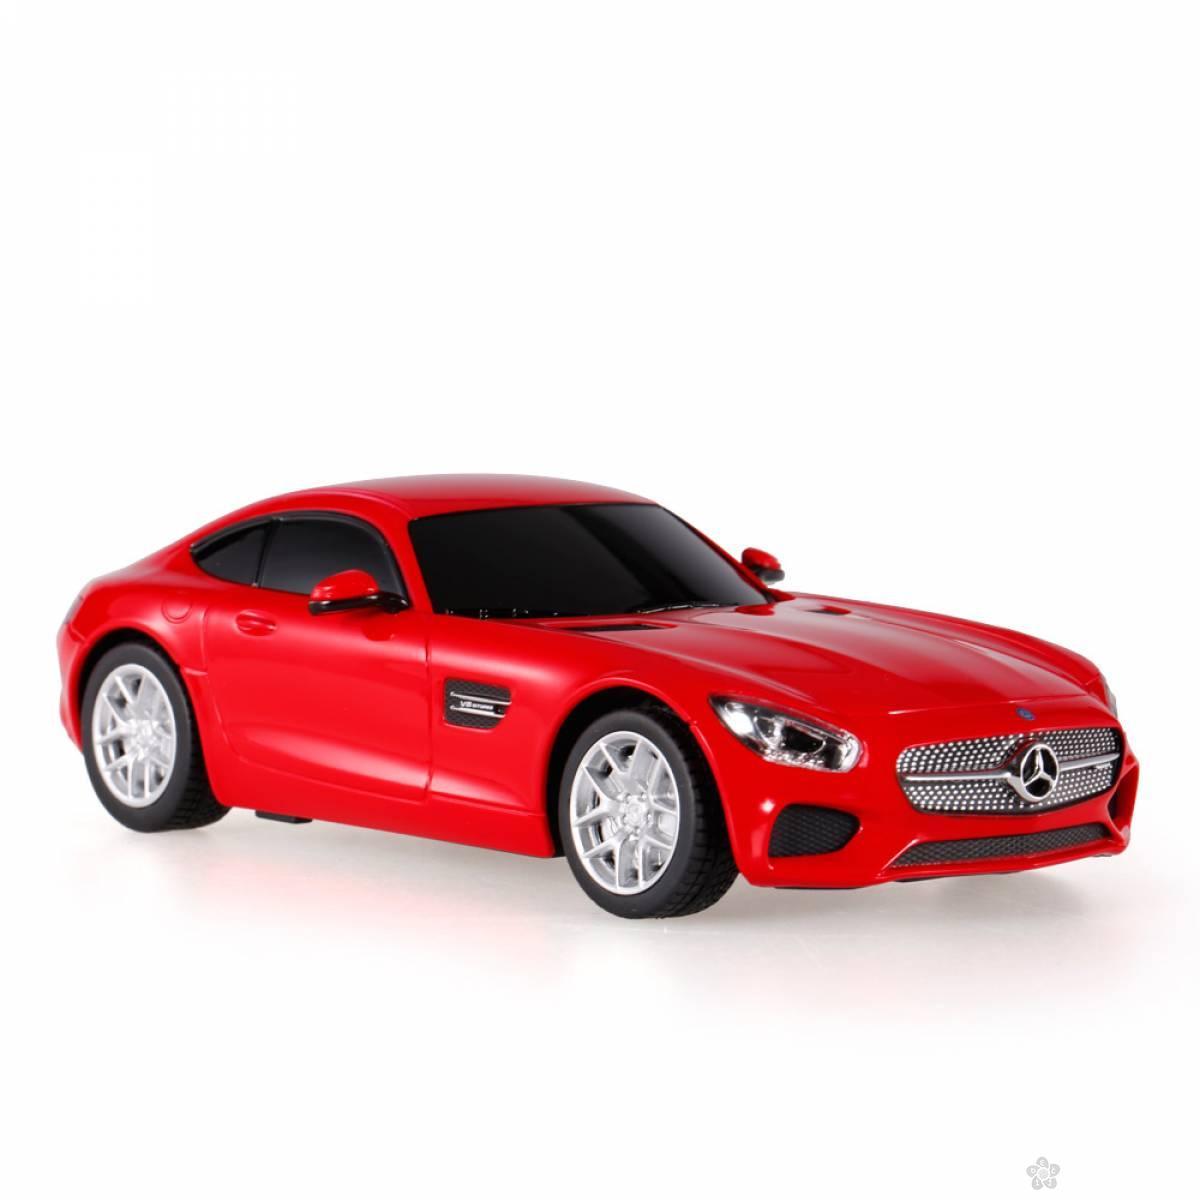 Auto R/C 1:24 Mercedes-AMG GT 72100